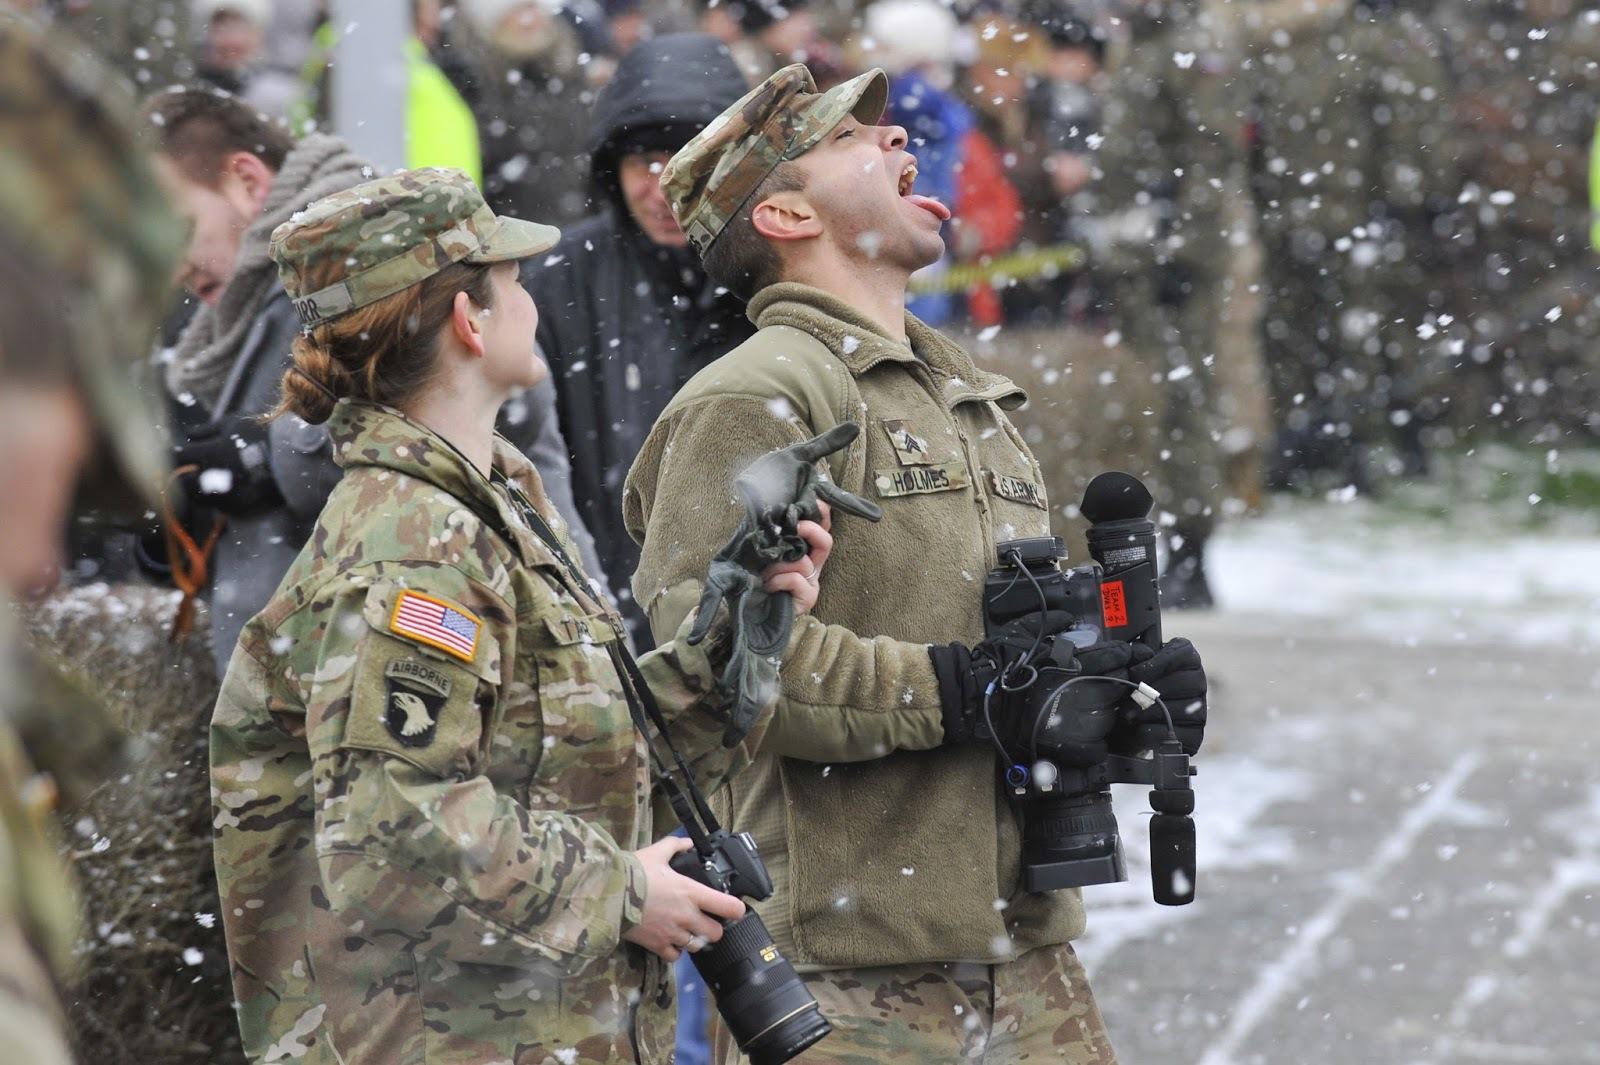 Солдаты НАТО безобразничают в Прибалтике. солдаты